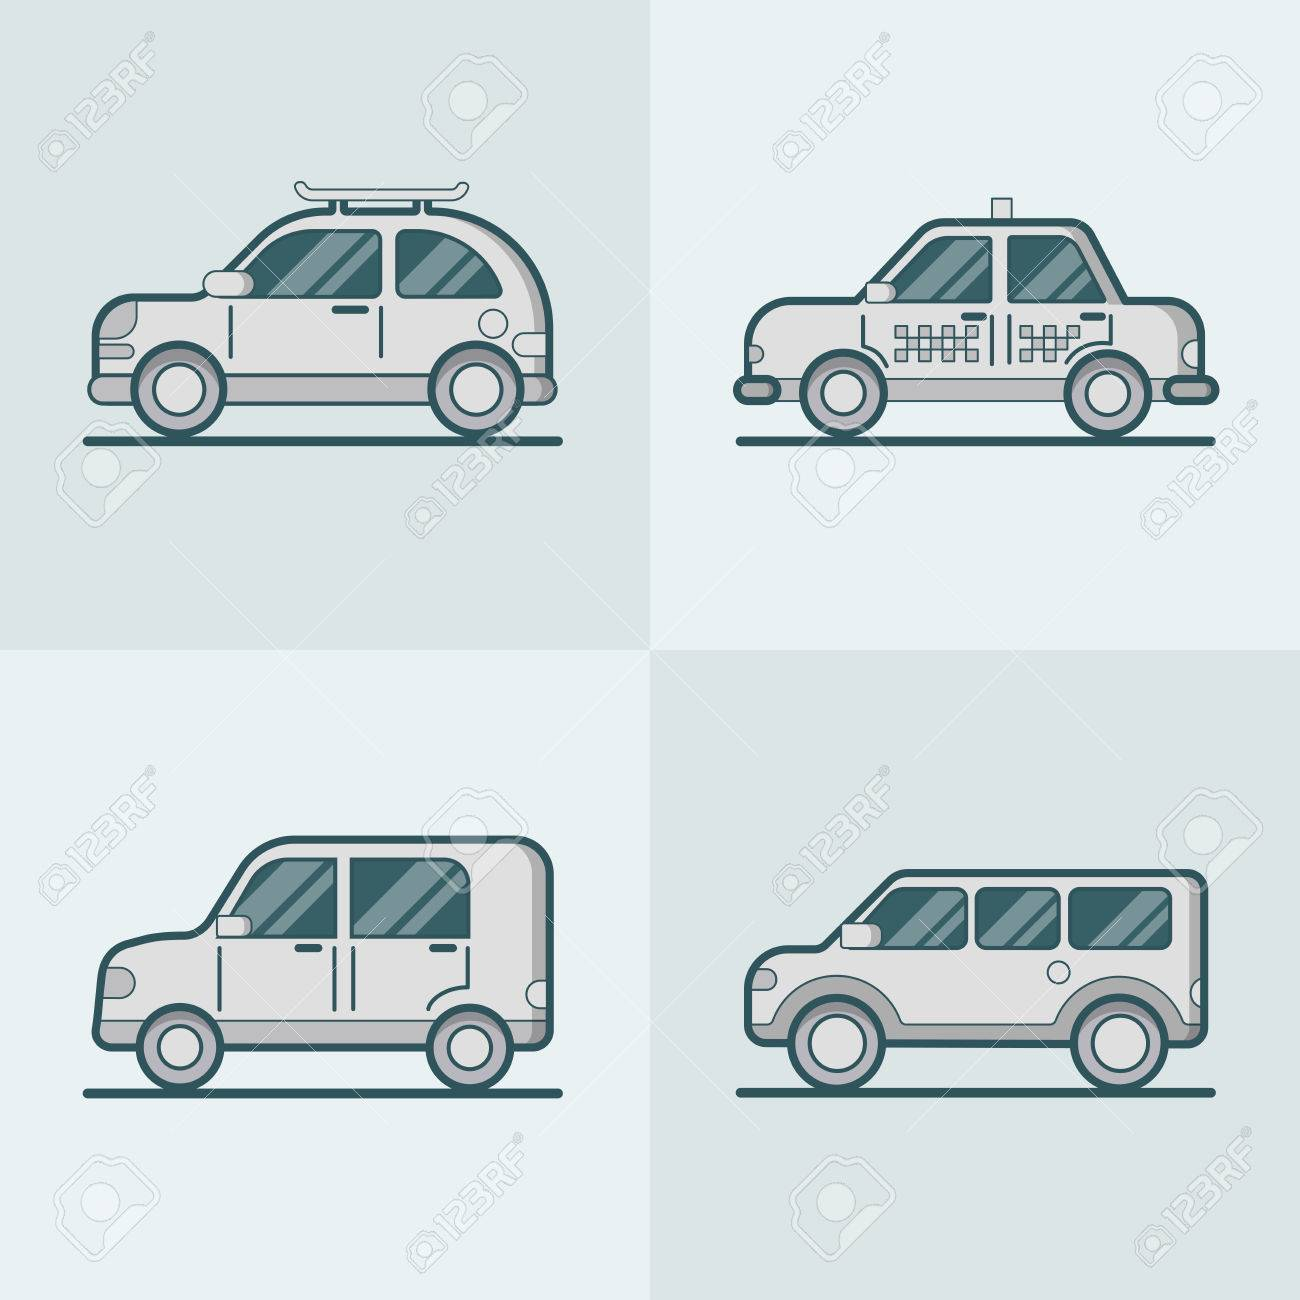 Passenger Car Van Suv Taxi Road Lineart Line Art Transport Set